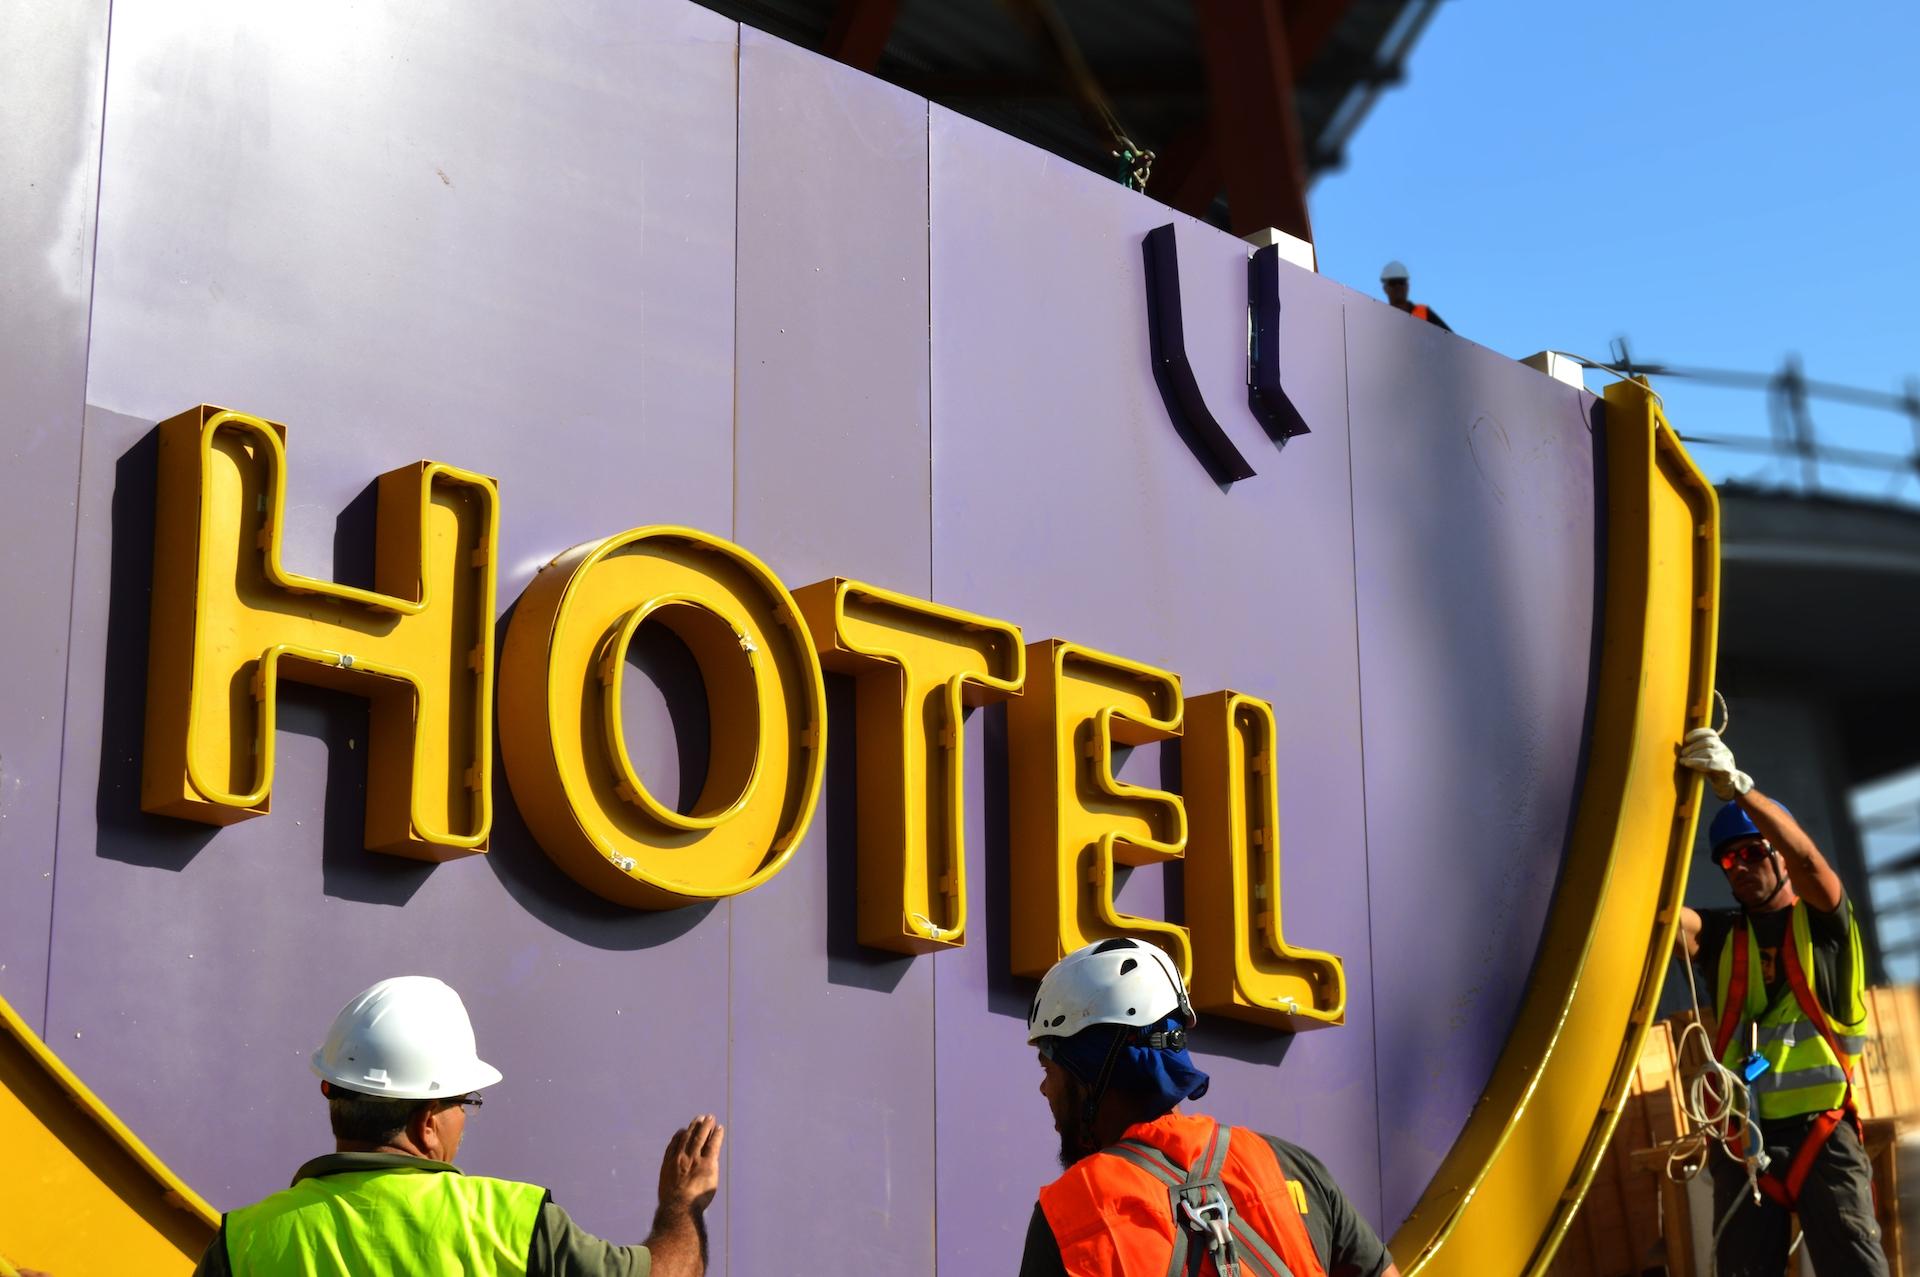 Lógistca e instalacion de luminosos corpóreos., Hard Rock Hotel Tenerife